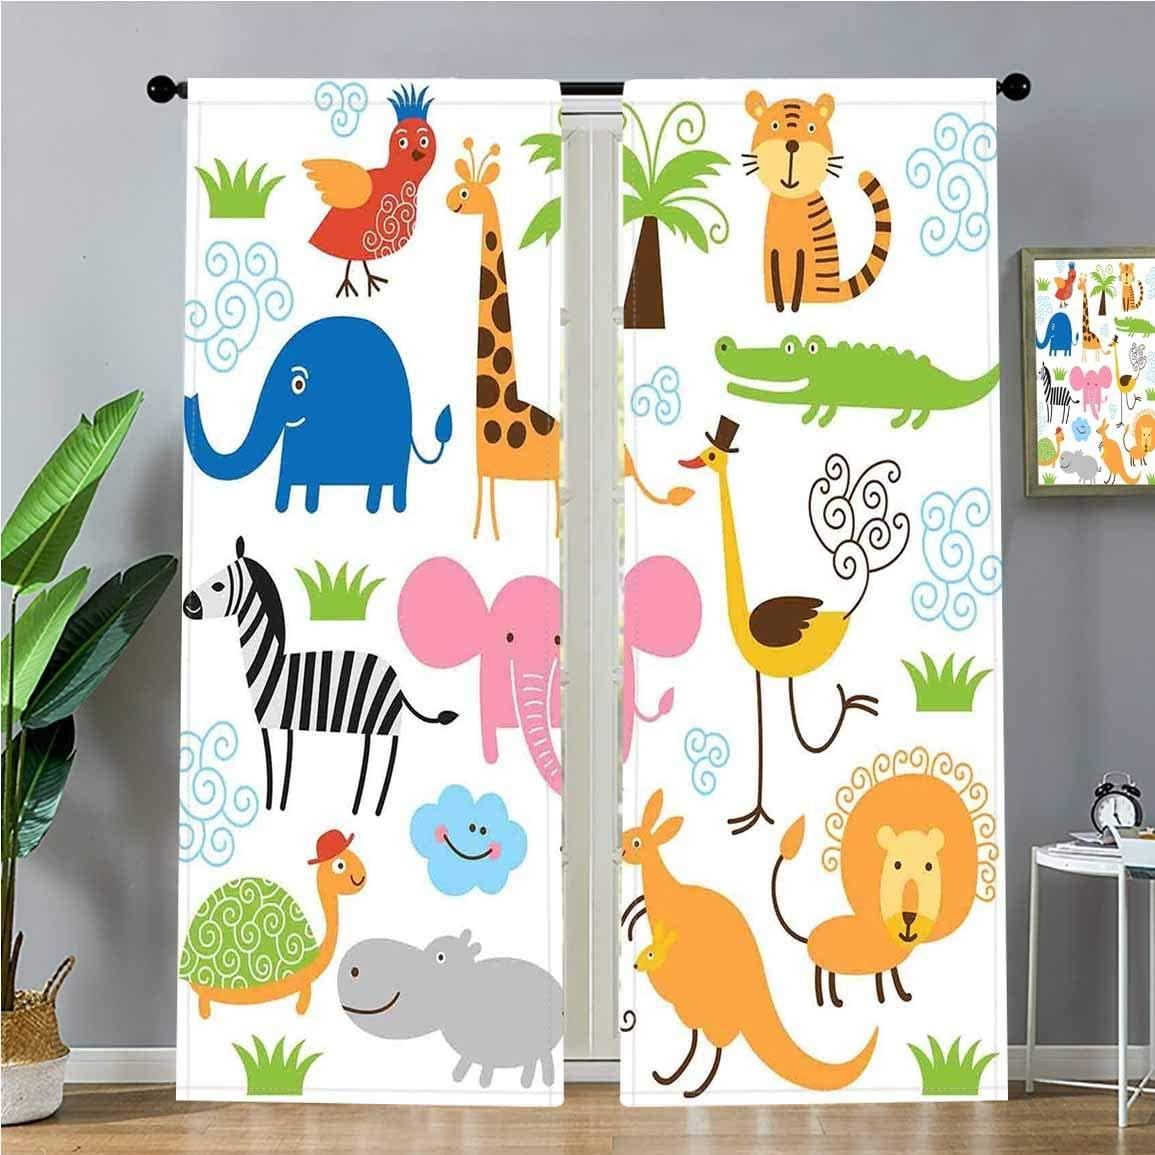 SoSung Blackout Curtains Cute Set of Giraffe Elephant Zebra Turtle Kids Nursery Baby Themed Cartoon Comic Print Window Treatments 2 Panel Set for Living Room Bedroom Decor,W52 x L72